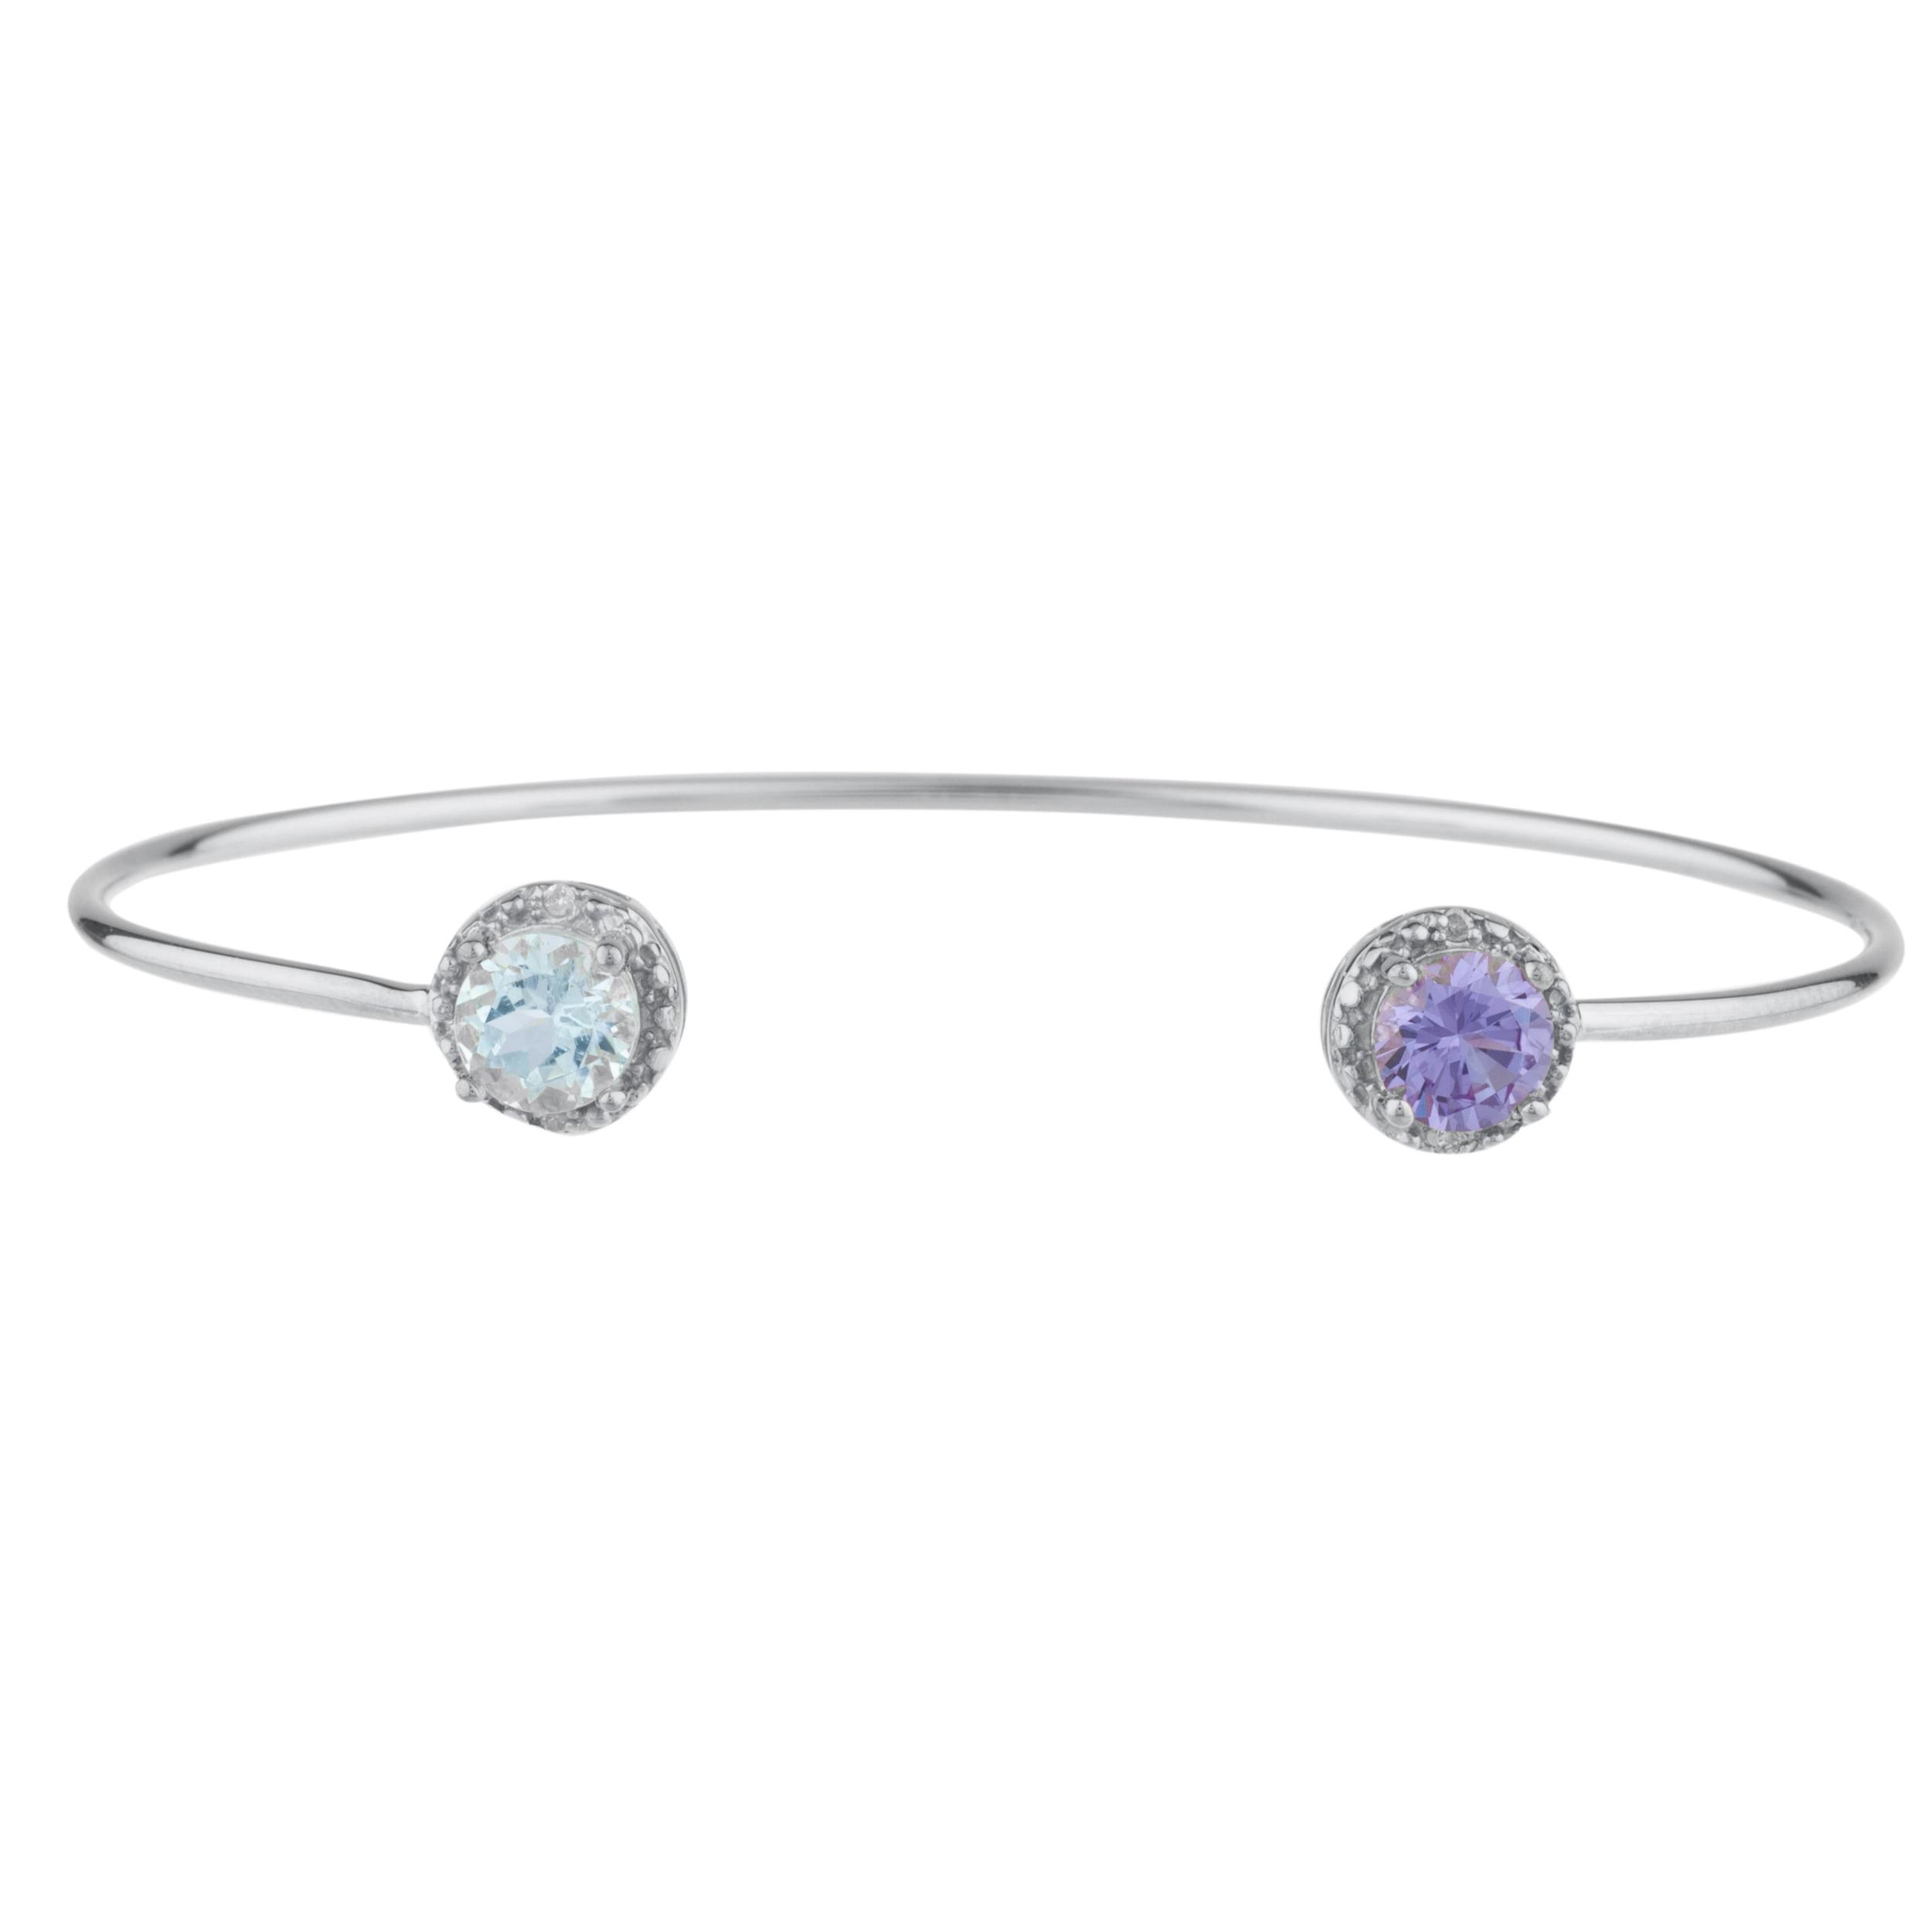 Aquamarine & Alexandrite Diamond Bangle Round Bracelet .925 Sterling Silver Rhodium Finish by Elizabeth Jewelry Inc